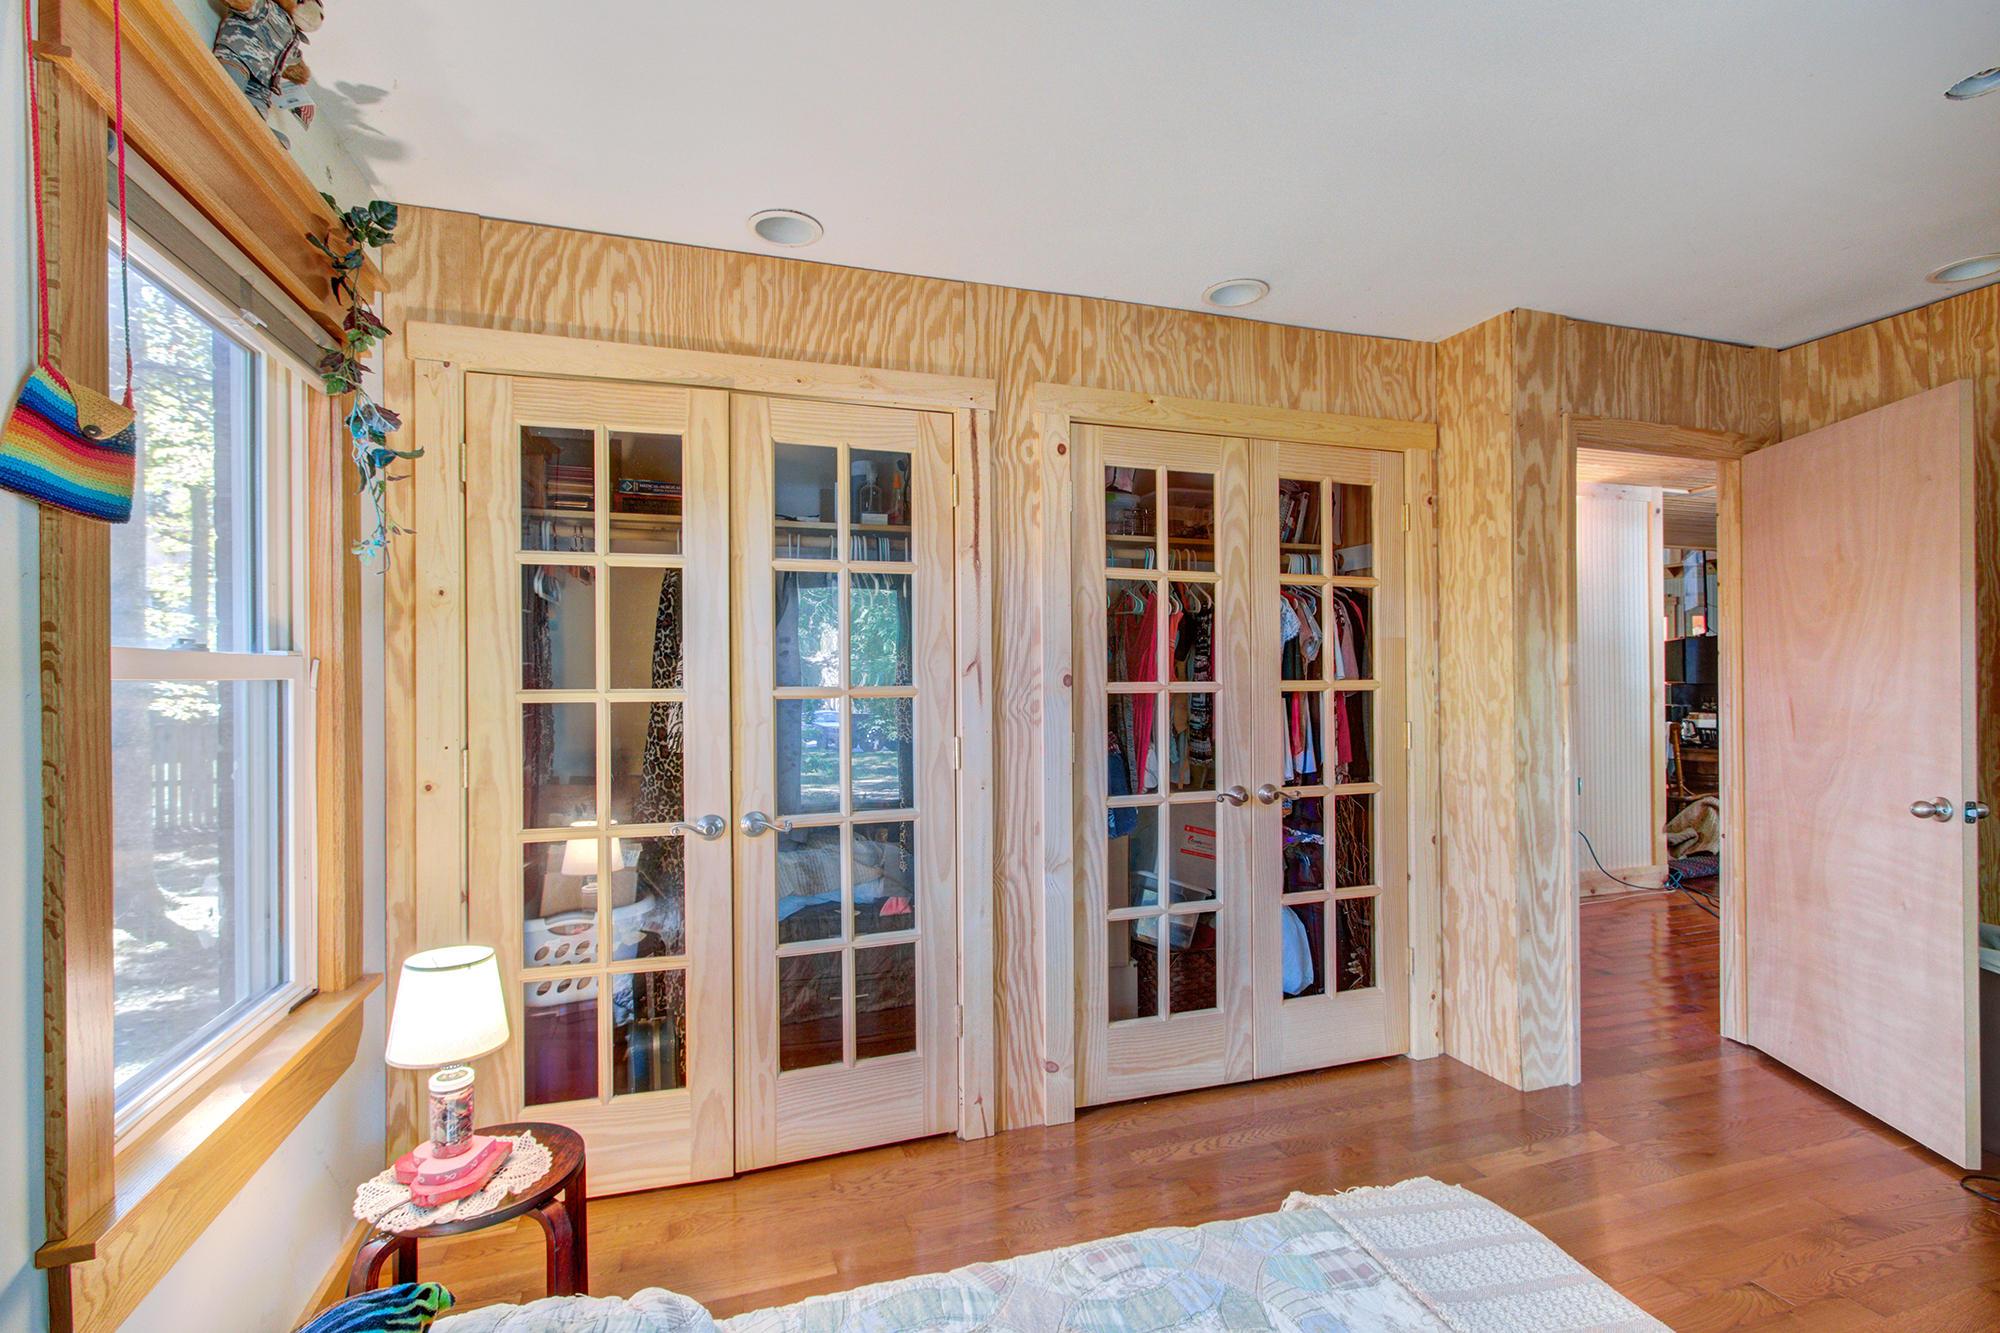 Wando Lakes Homes For Sale - 858 Fairlawn, Mount Pleasant, SC - 22